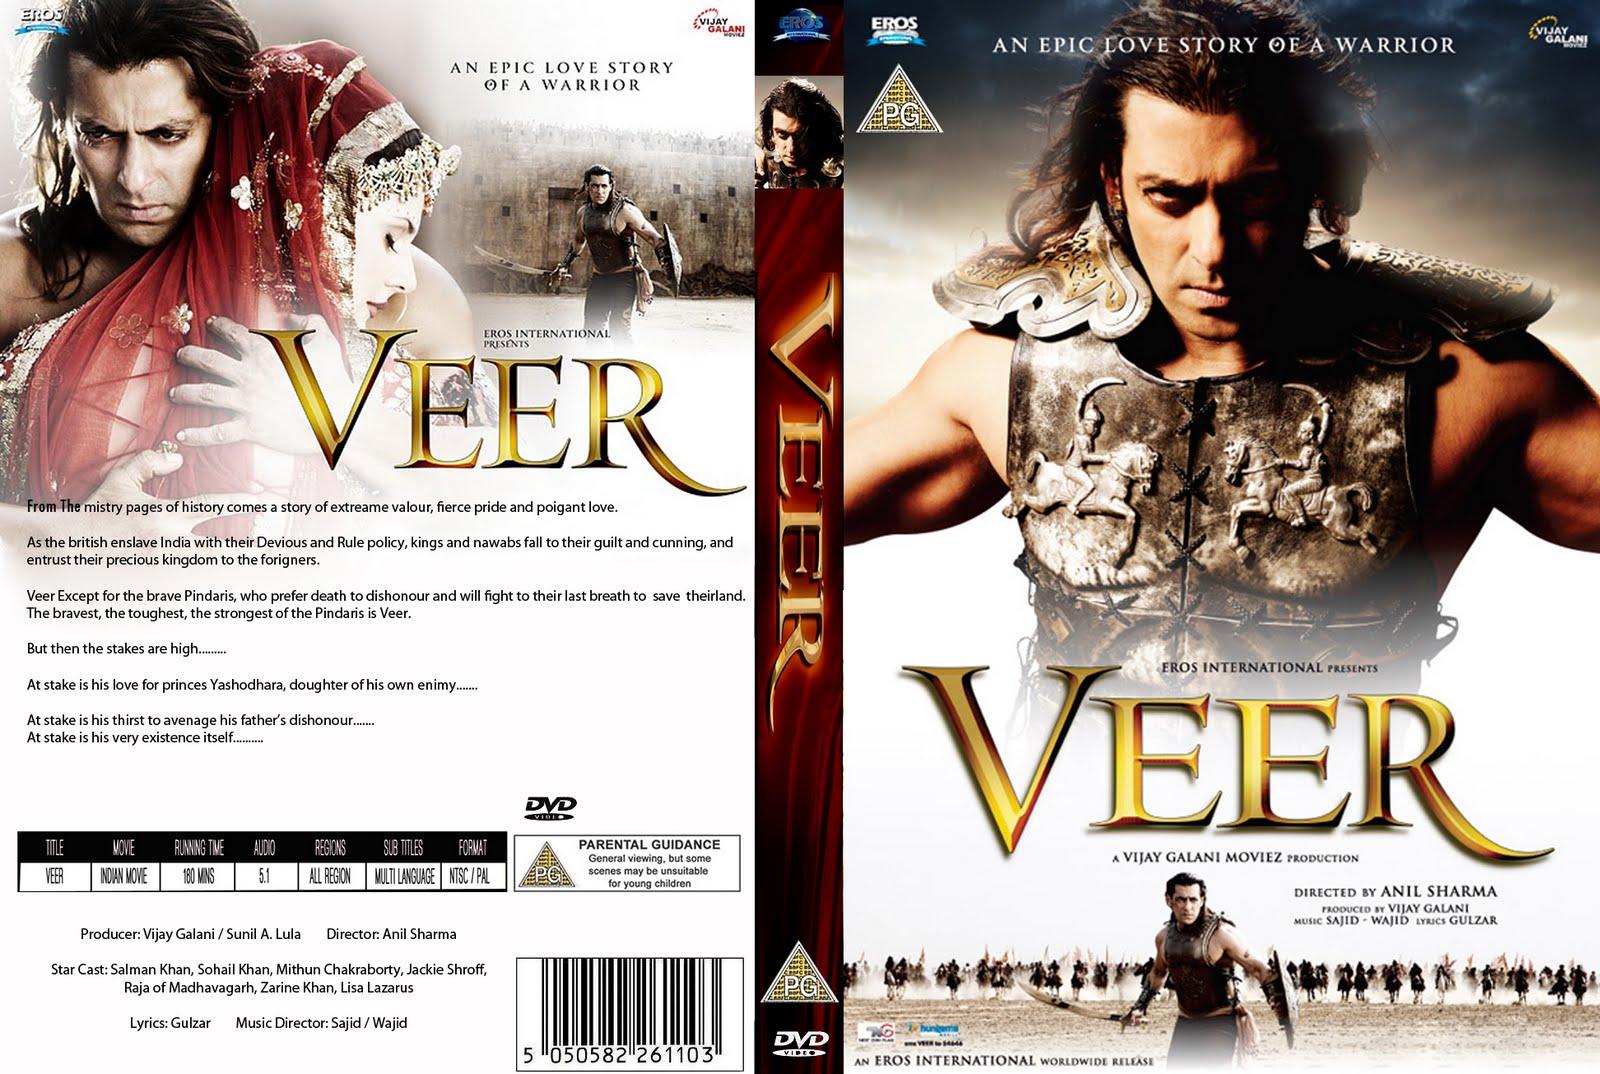 Entertainment: Veer DVD cover